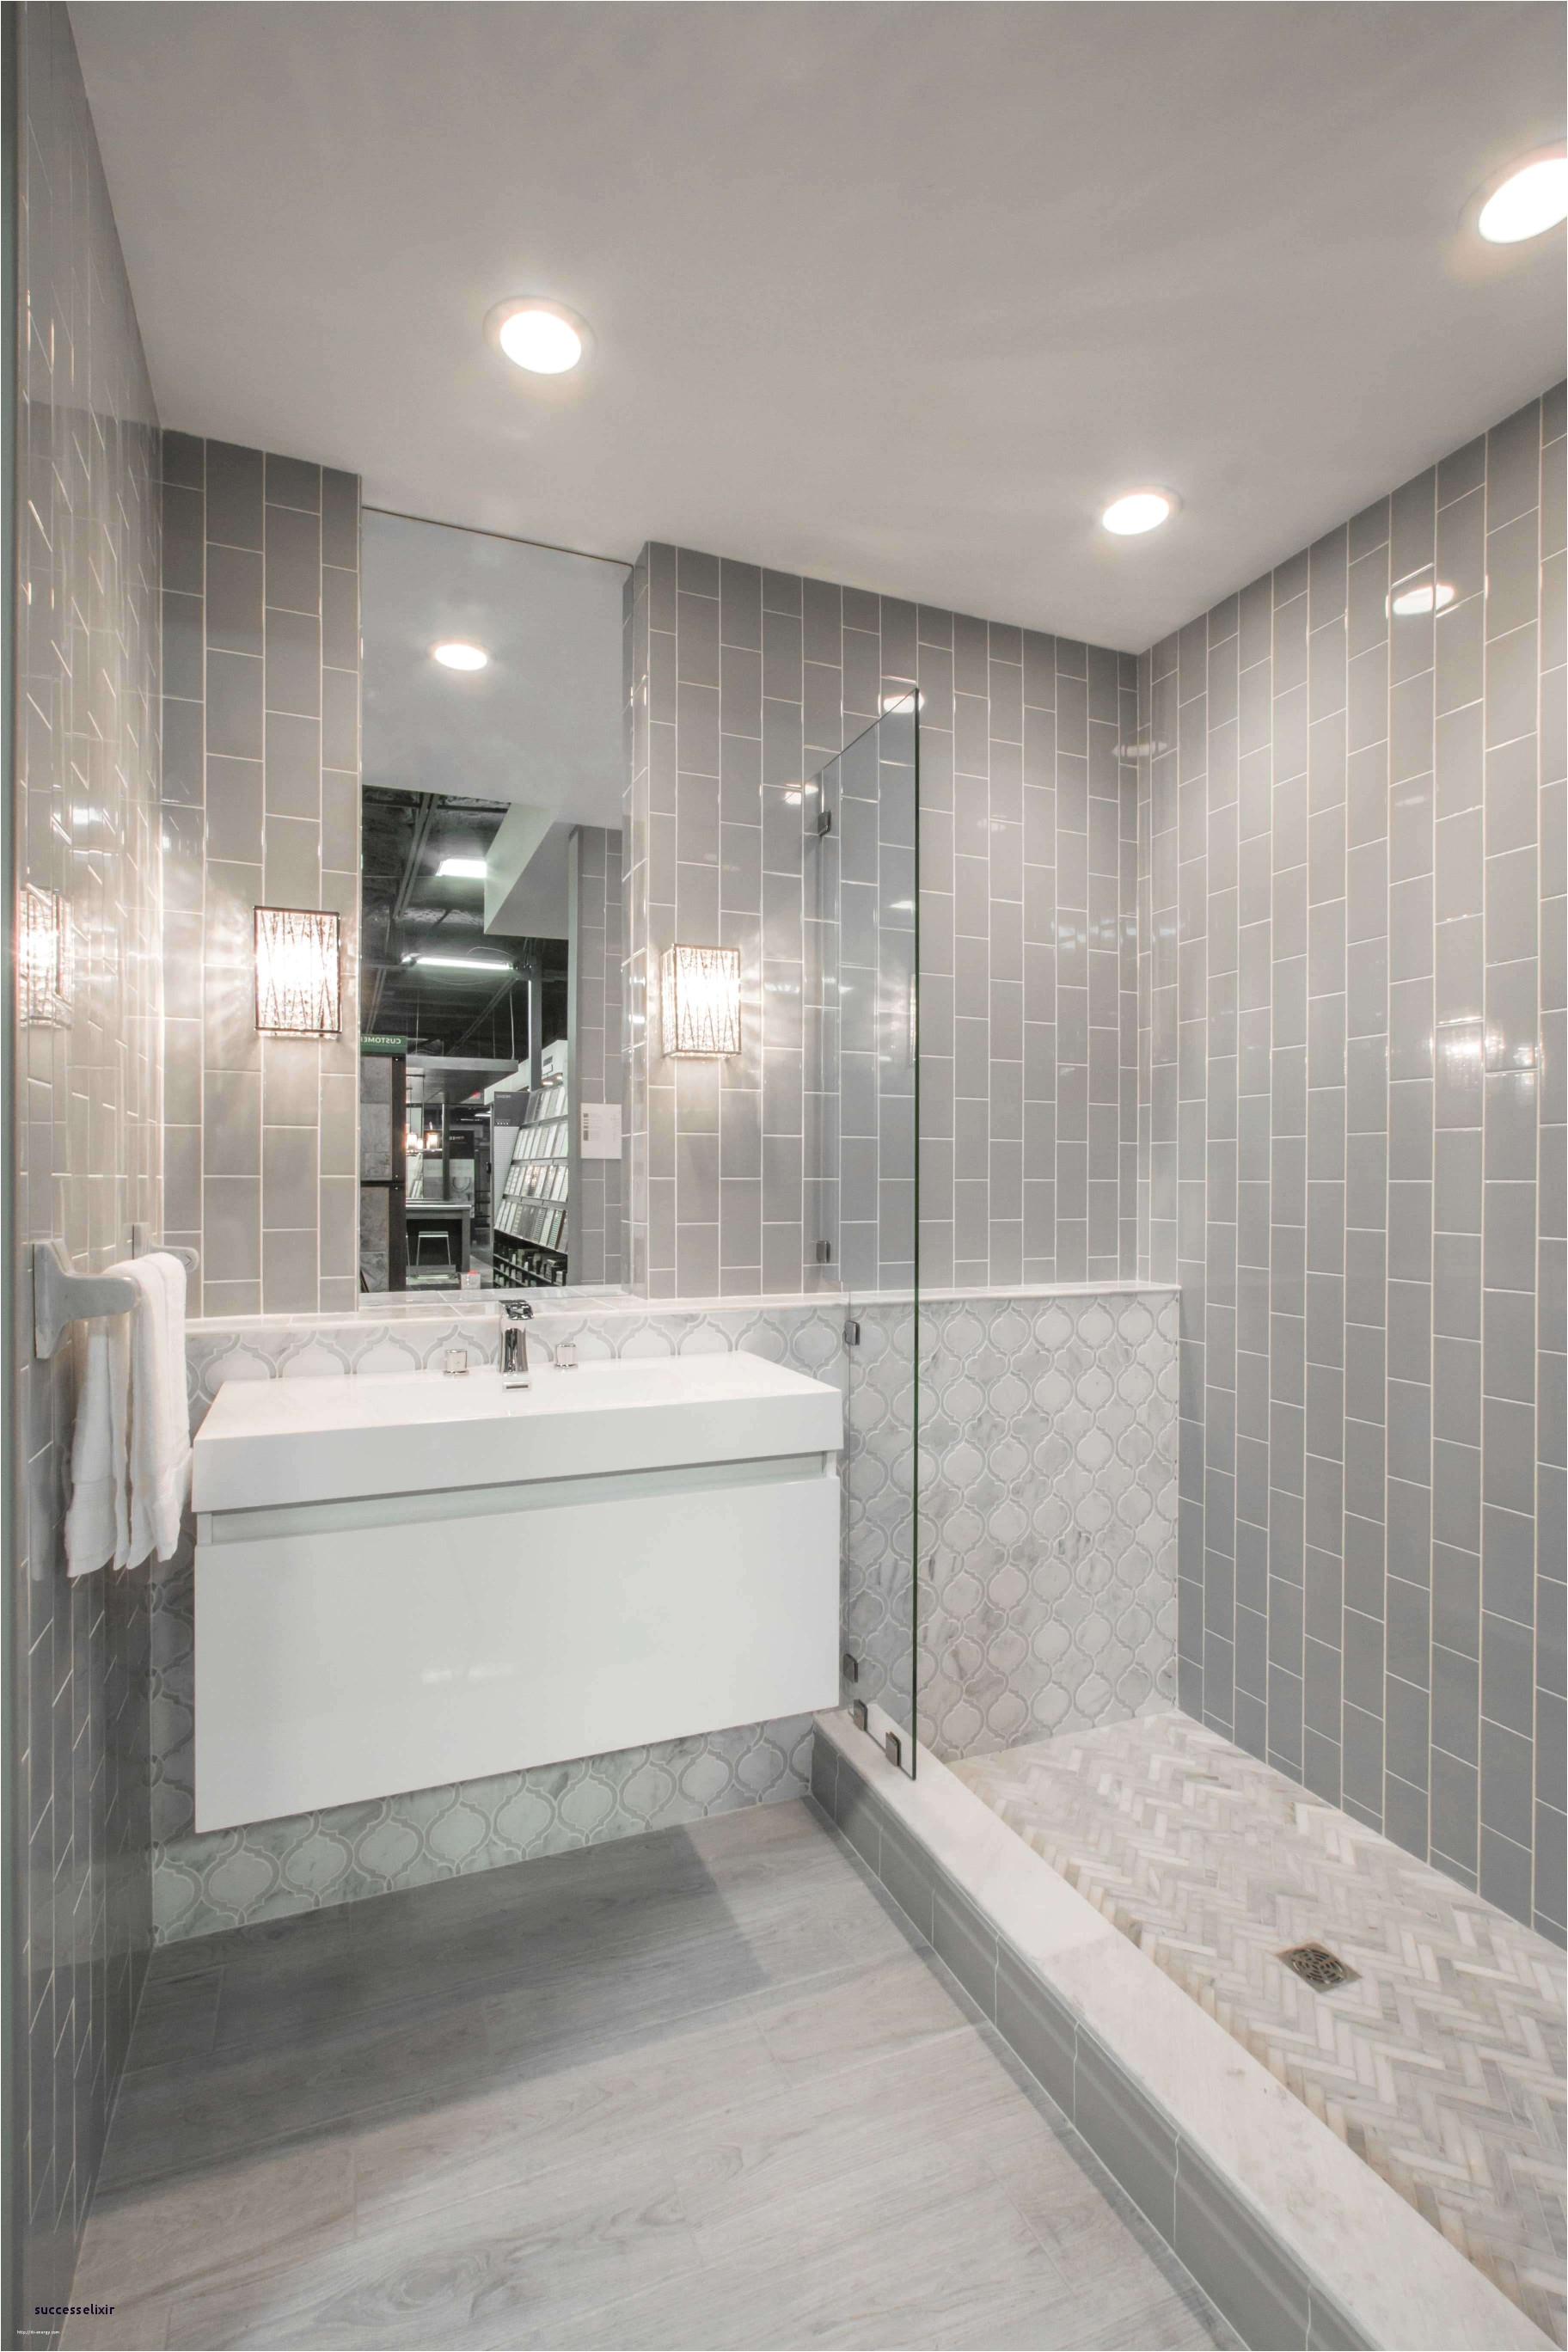 Bathtubs with Doors Lovely Bathroom Tubs with Shower Amukraine